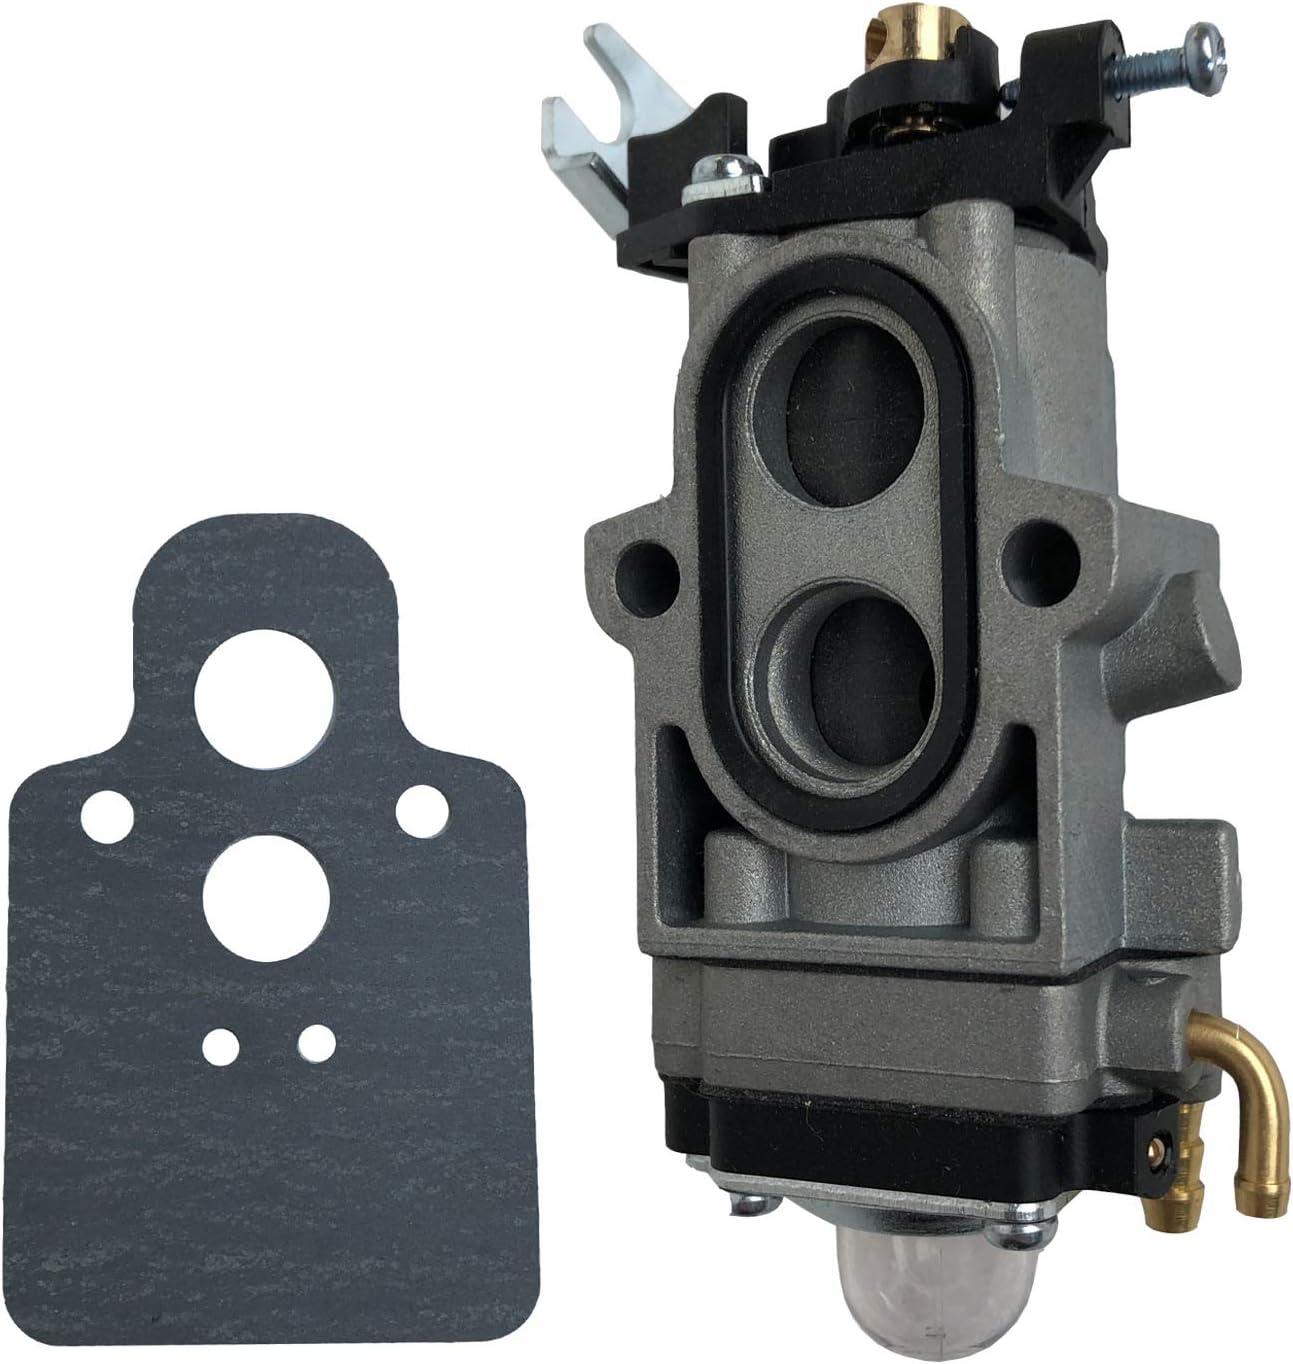 JERDE Carburetor for Redmax EBZ8500 EBZ8500RH Backpack Blowers #581 17 70-01